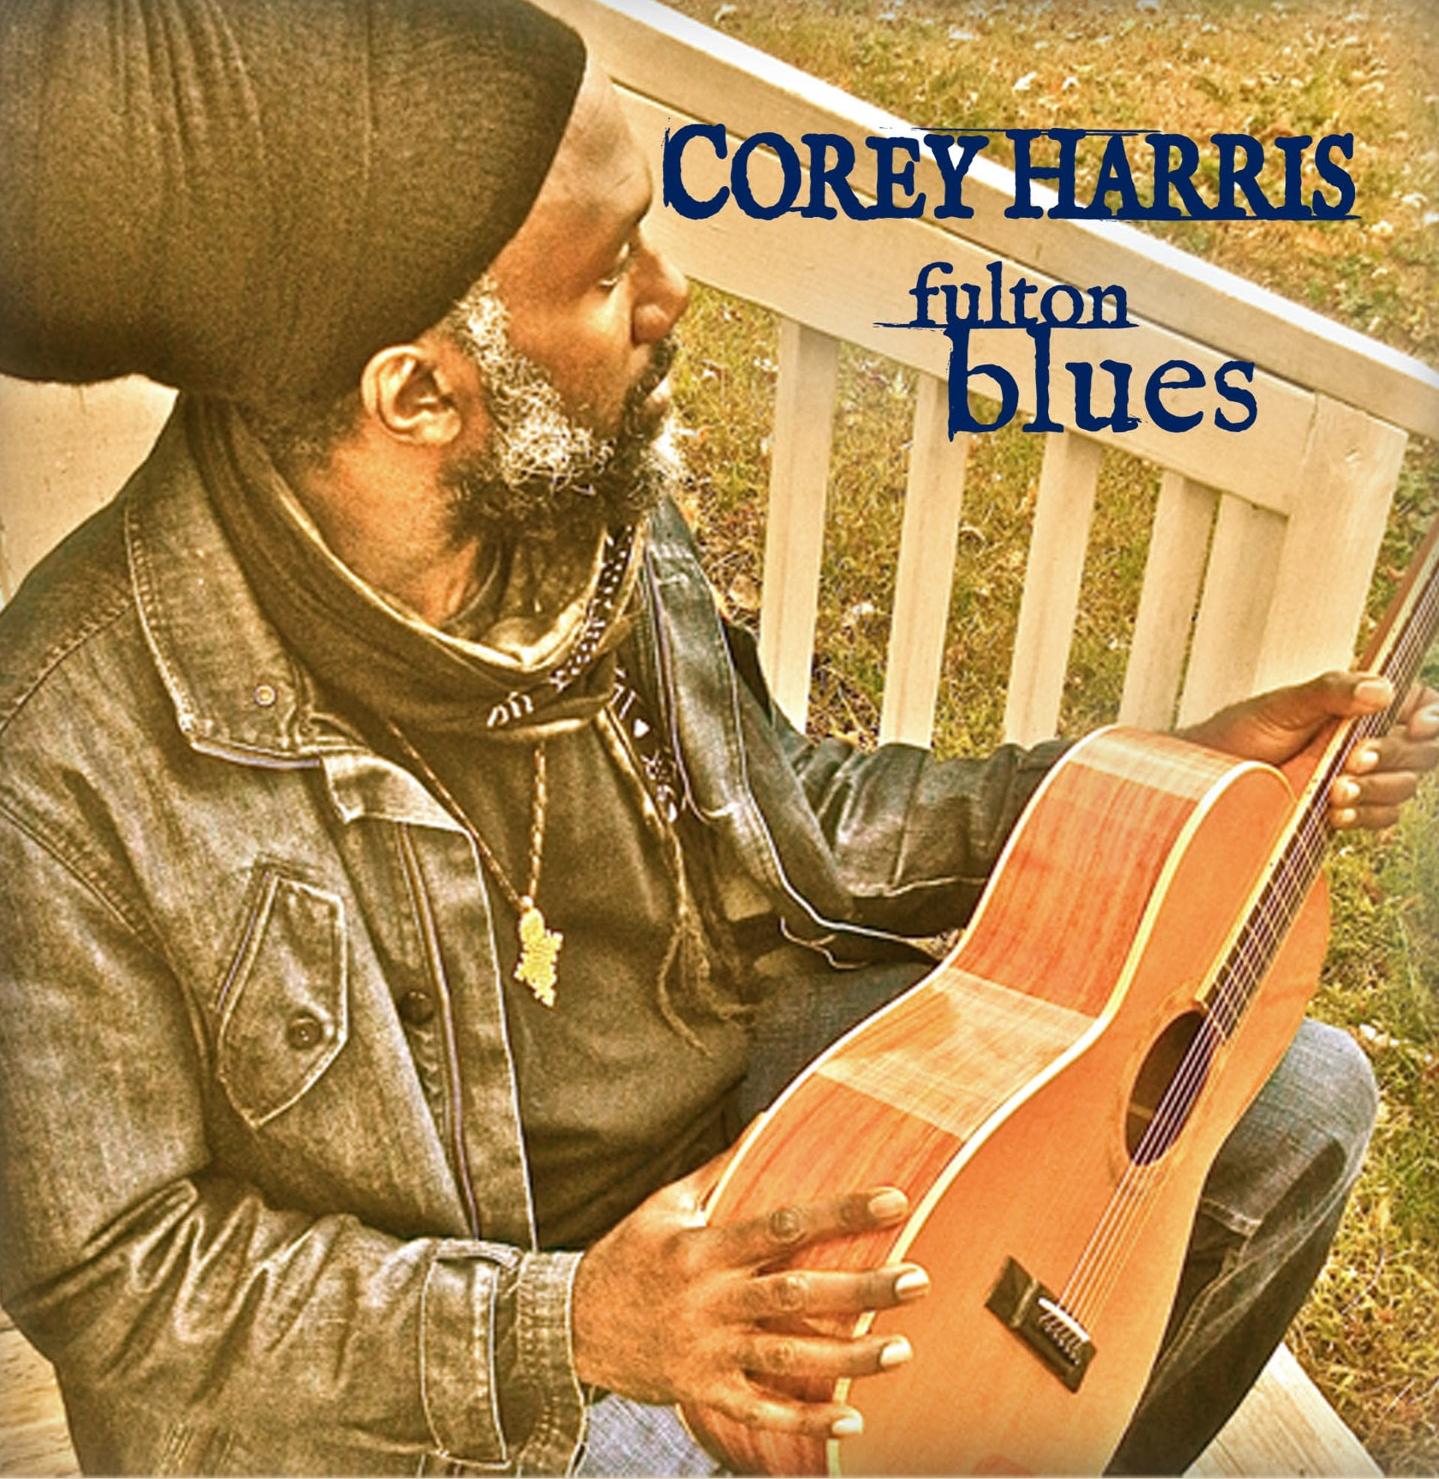 "Corey Harris ""Fulton Blues"" 2013 nuevo disco"